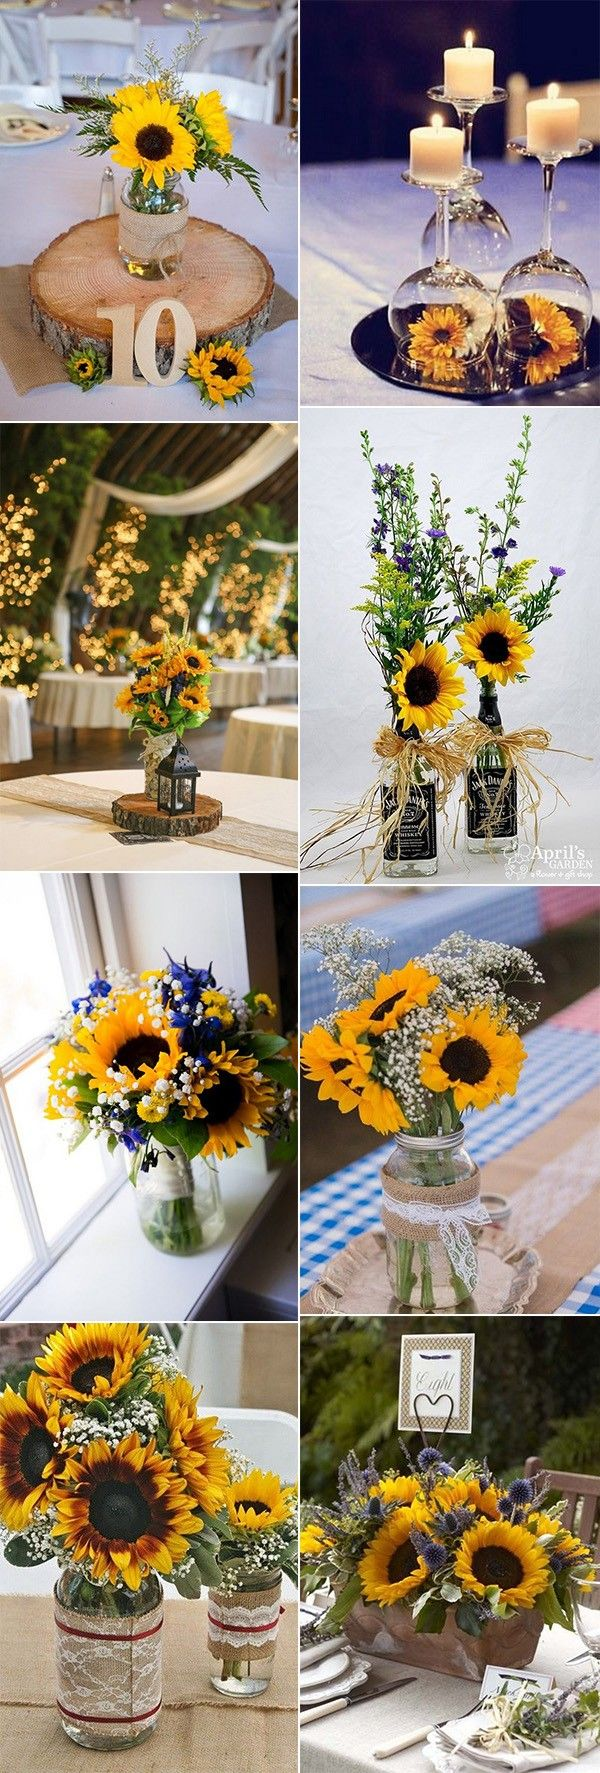 sunflowers themed wedding centerpiece ideas